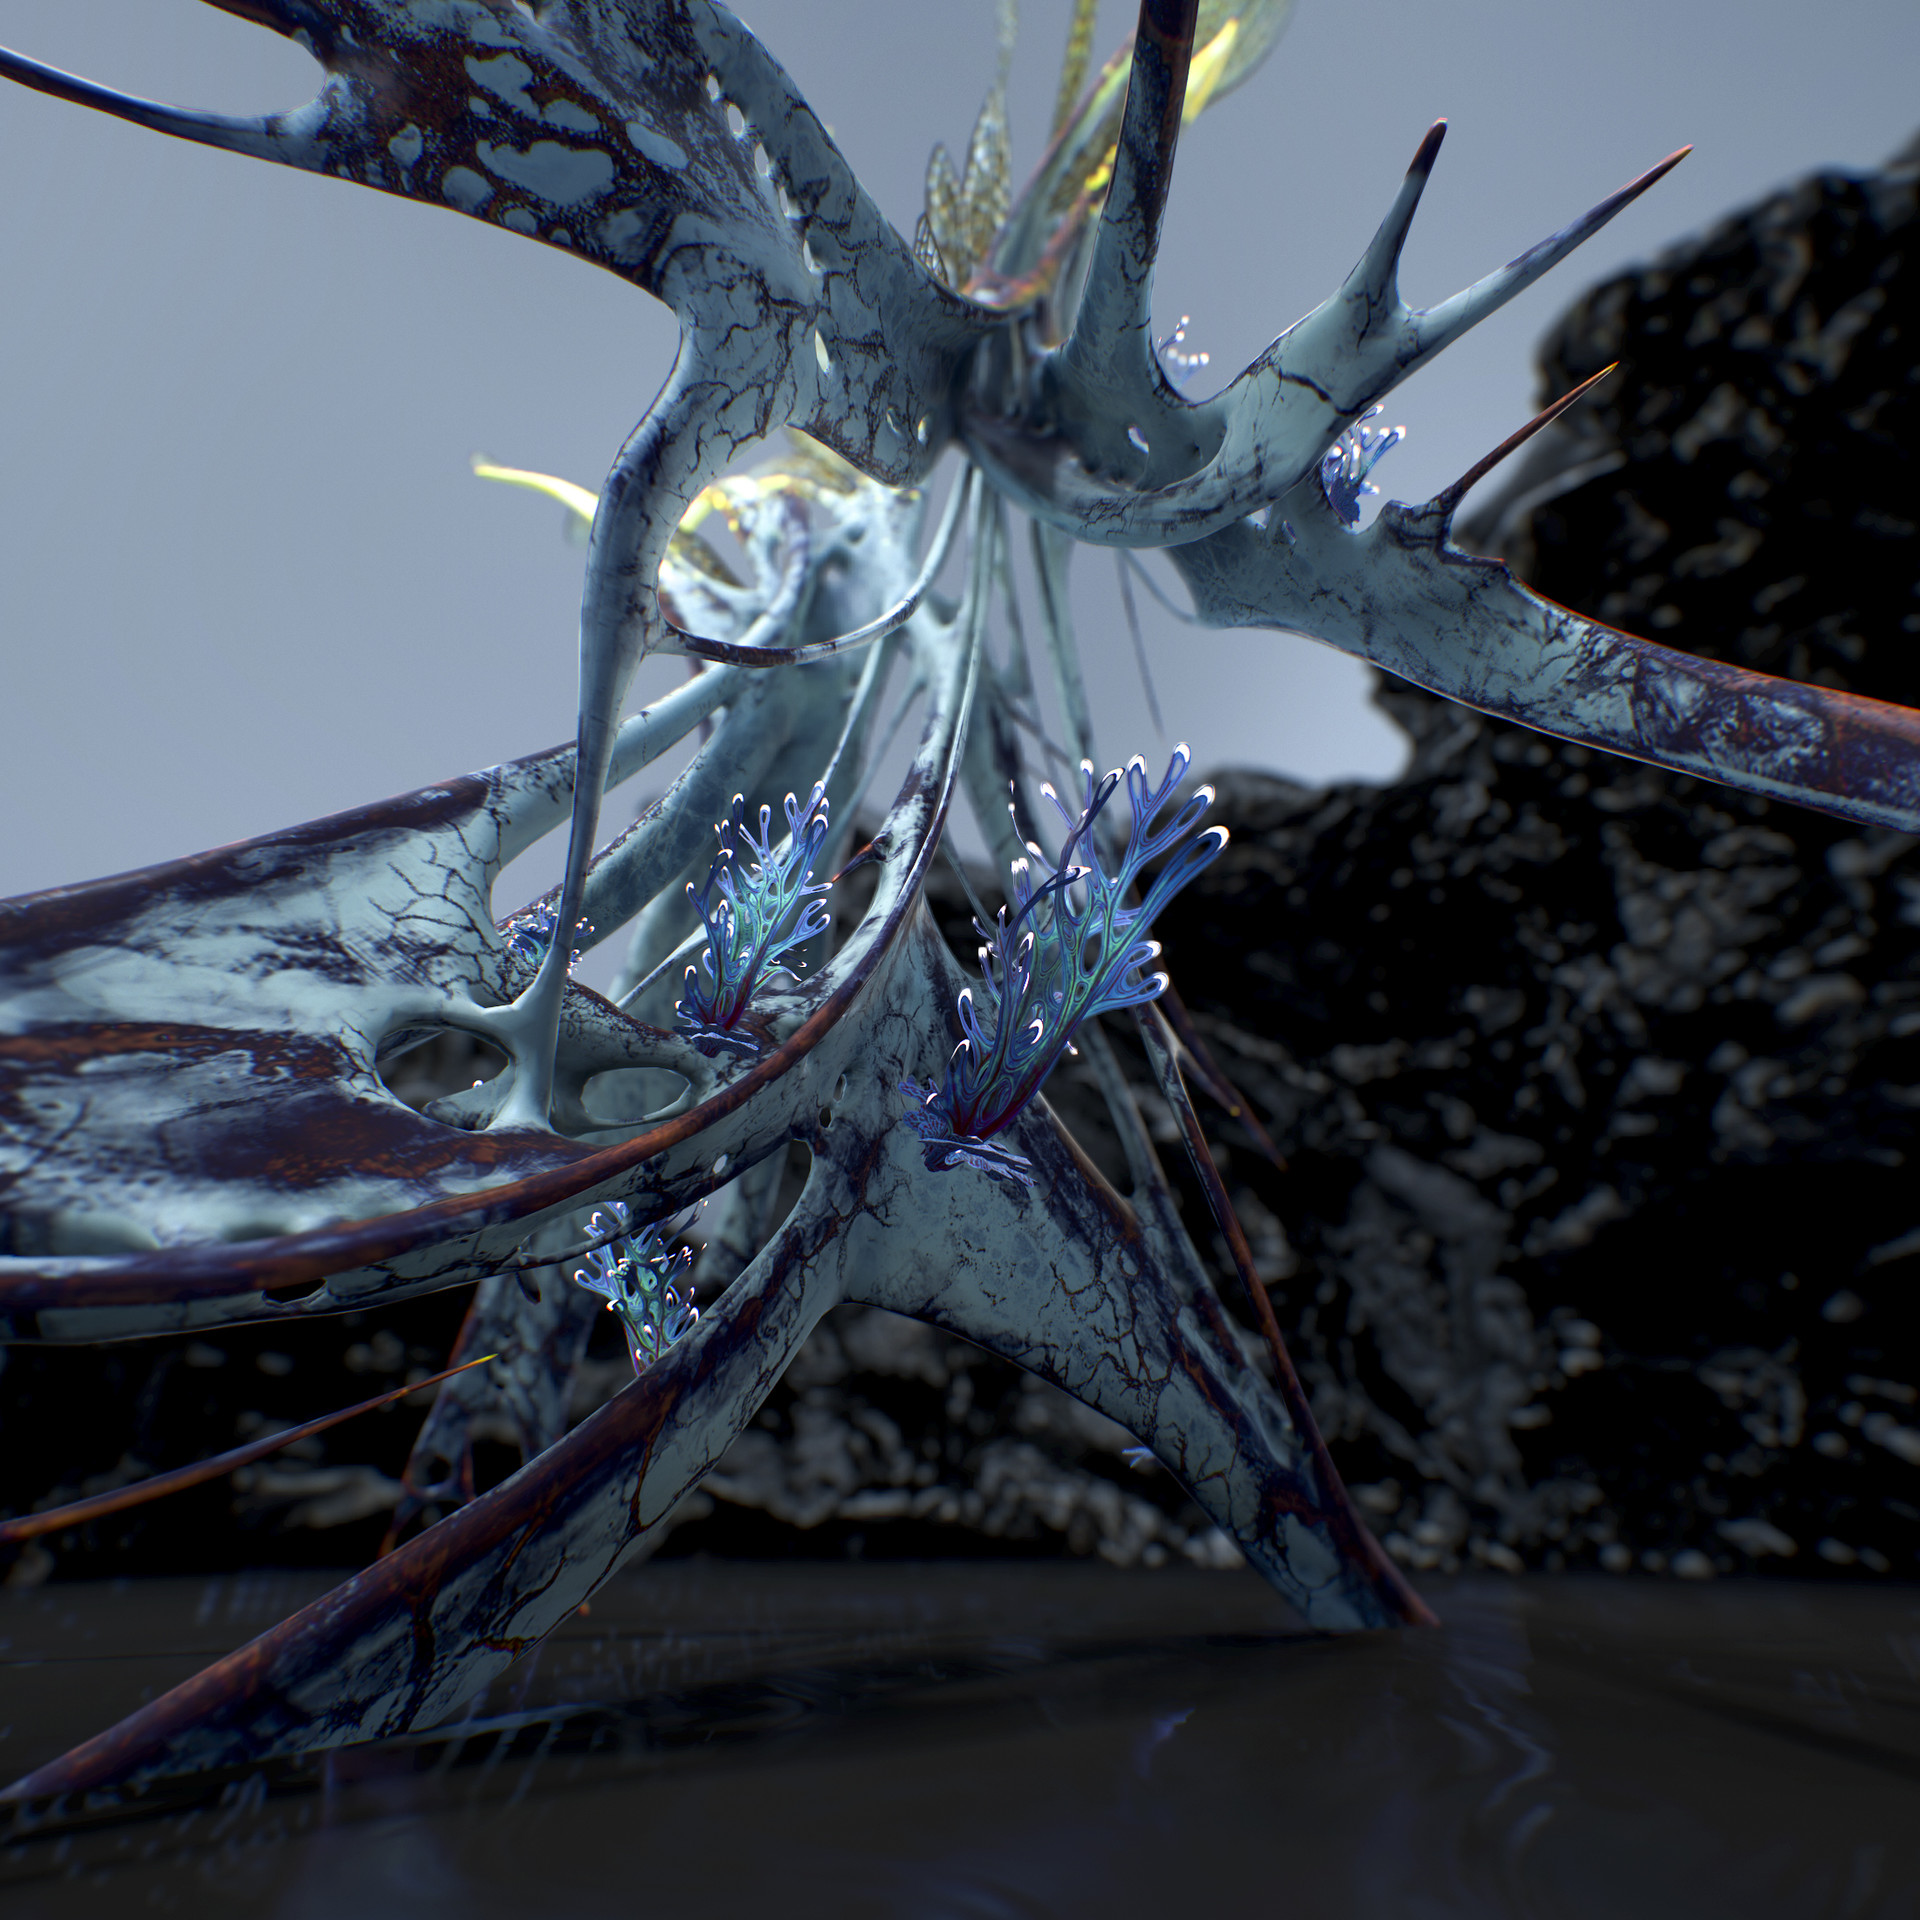 Johan de leenheer alien fern misota spletinus16